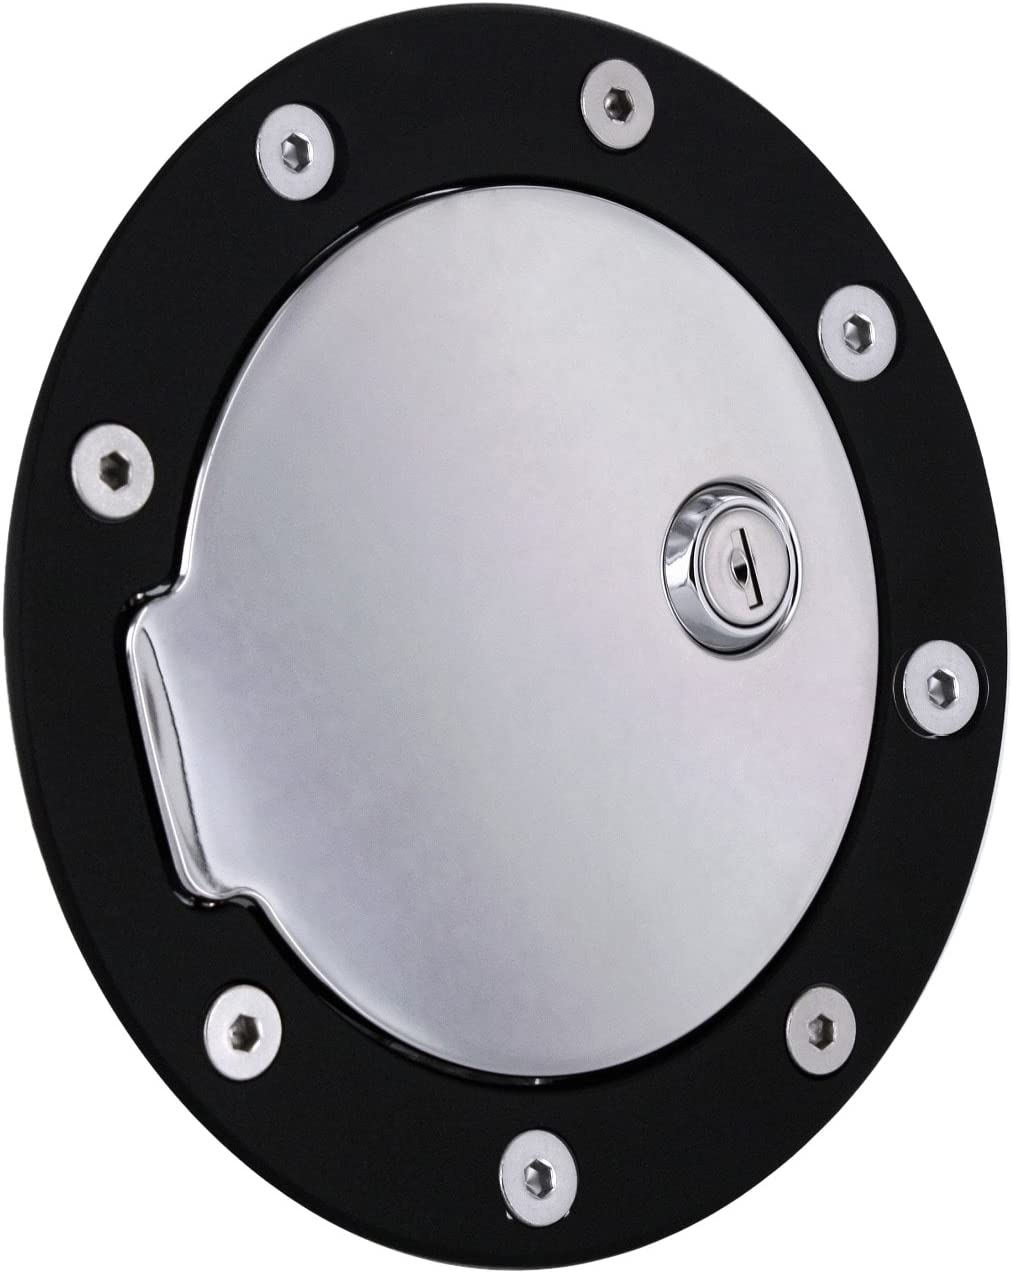 All Sales 6050KL Black Billet Aluminum Ring and Locking Fuel Door